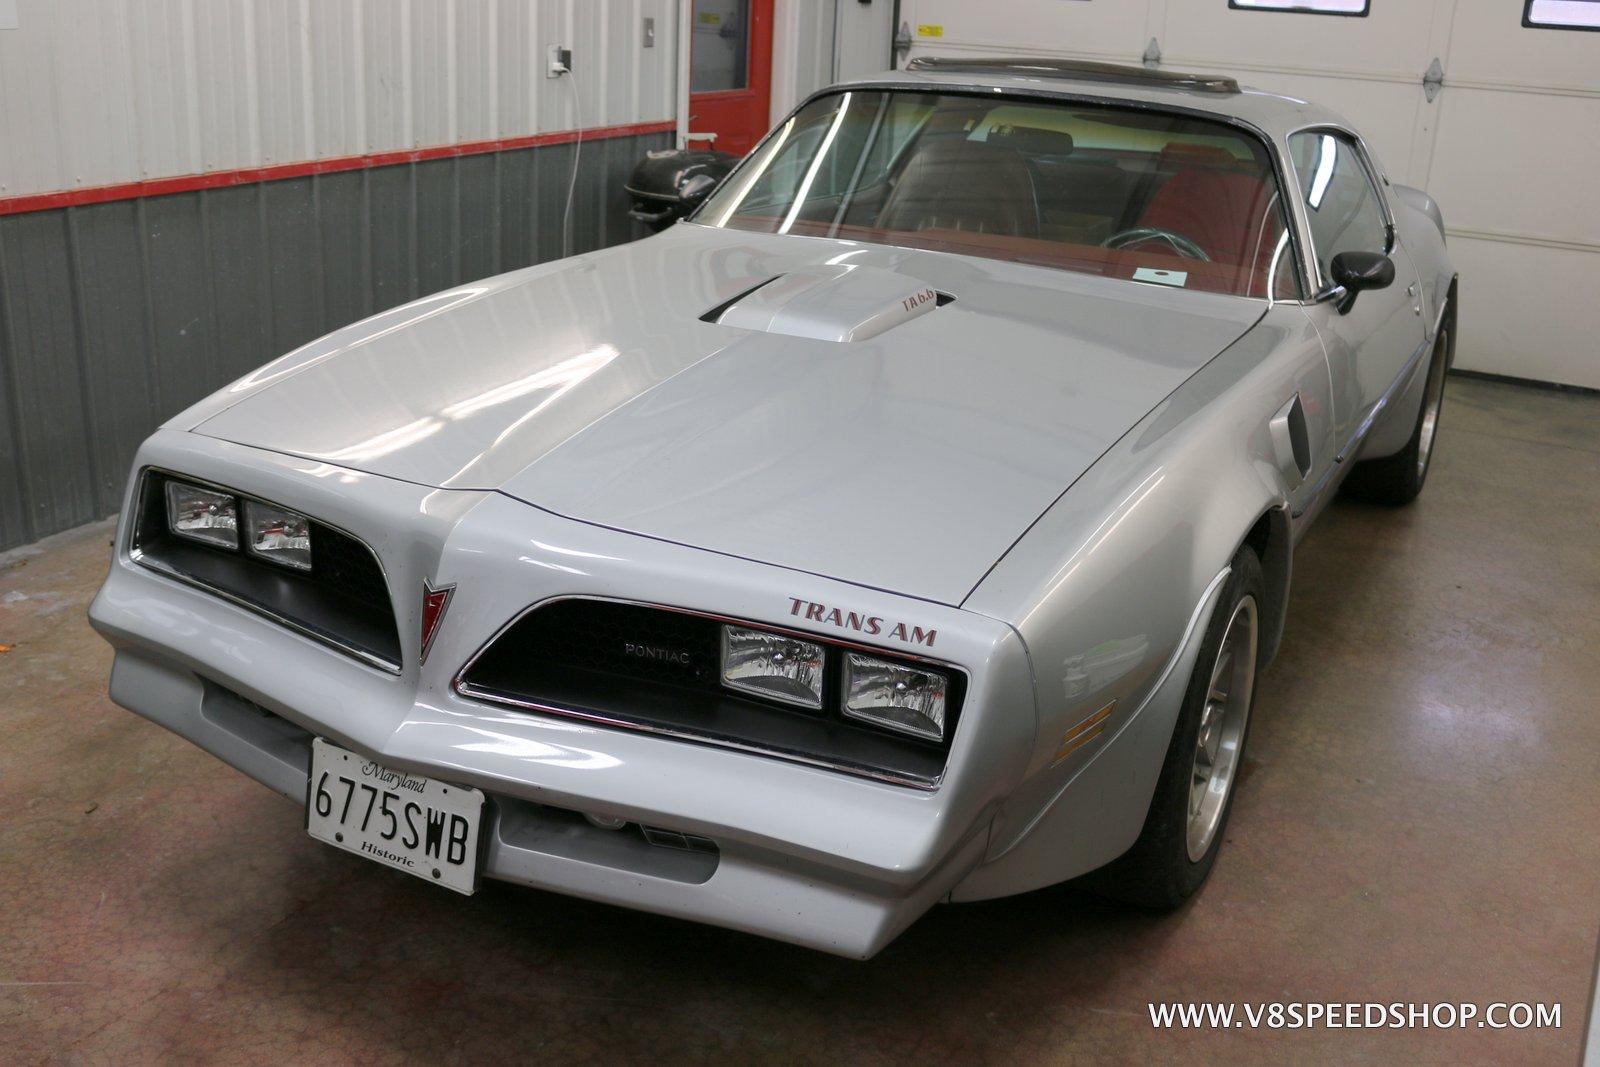 1977 Pontiac Trans Am Maintenence and Upgrades at V8 Speed & Resto Shop